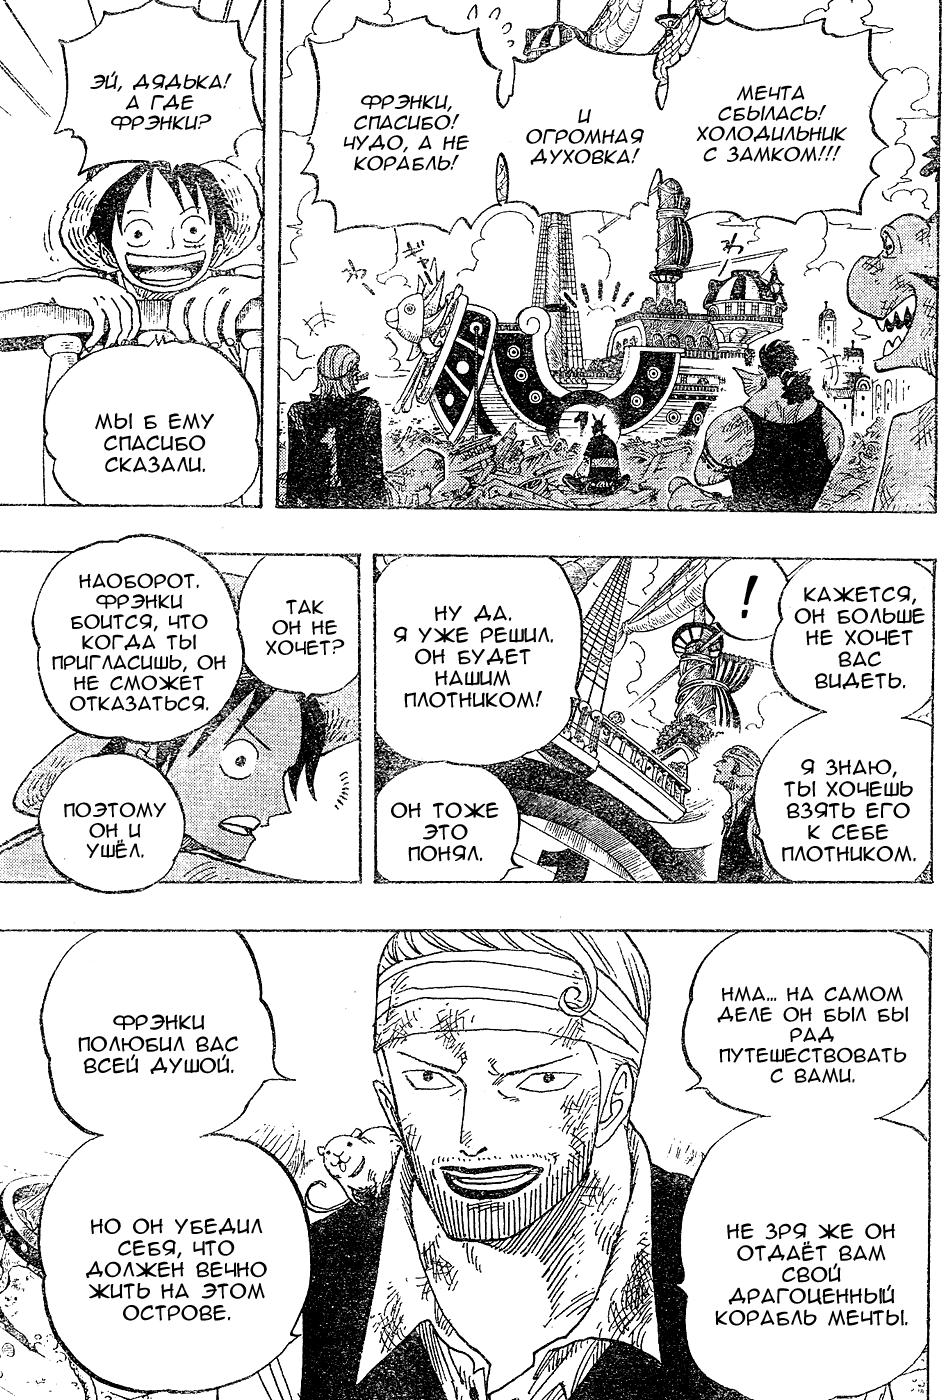 Манга One Piece / Ван Пис Манга One Piece Глава # 436 - Штаны с дома Фрэнки, страница 8